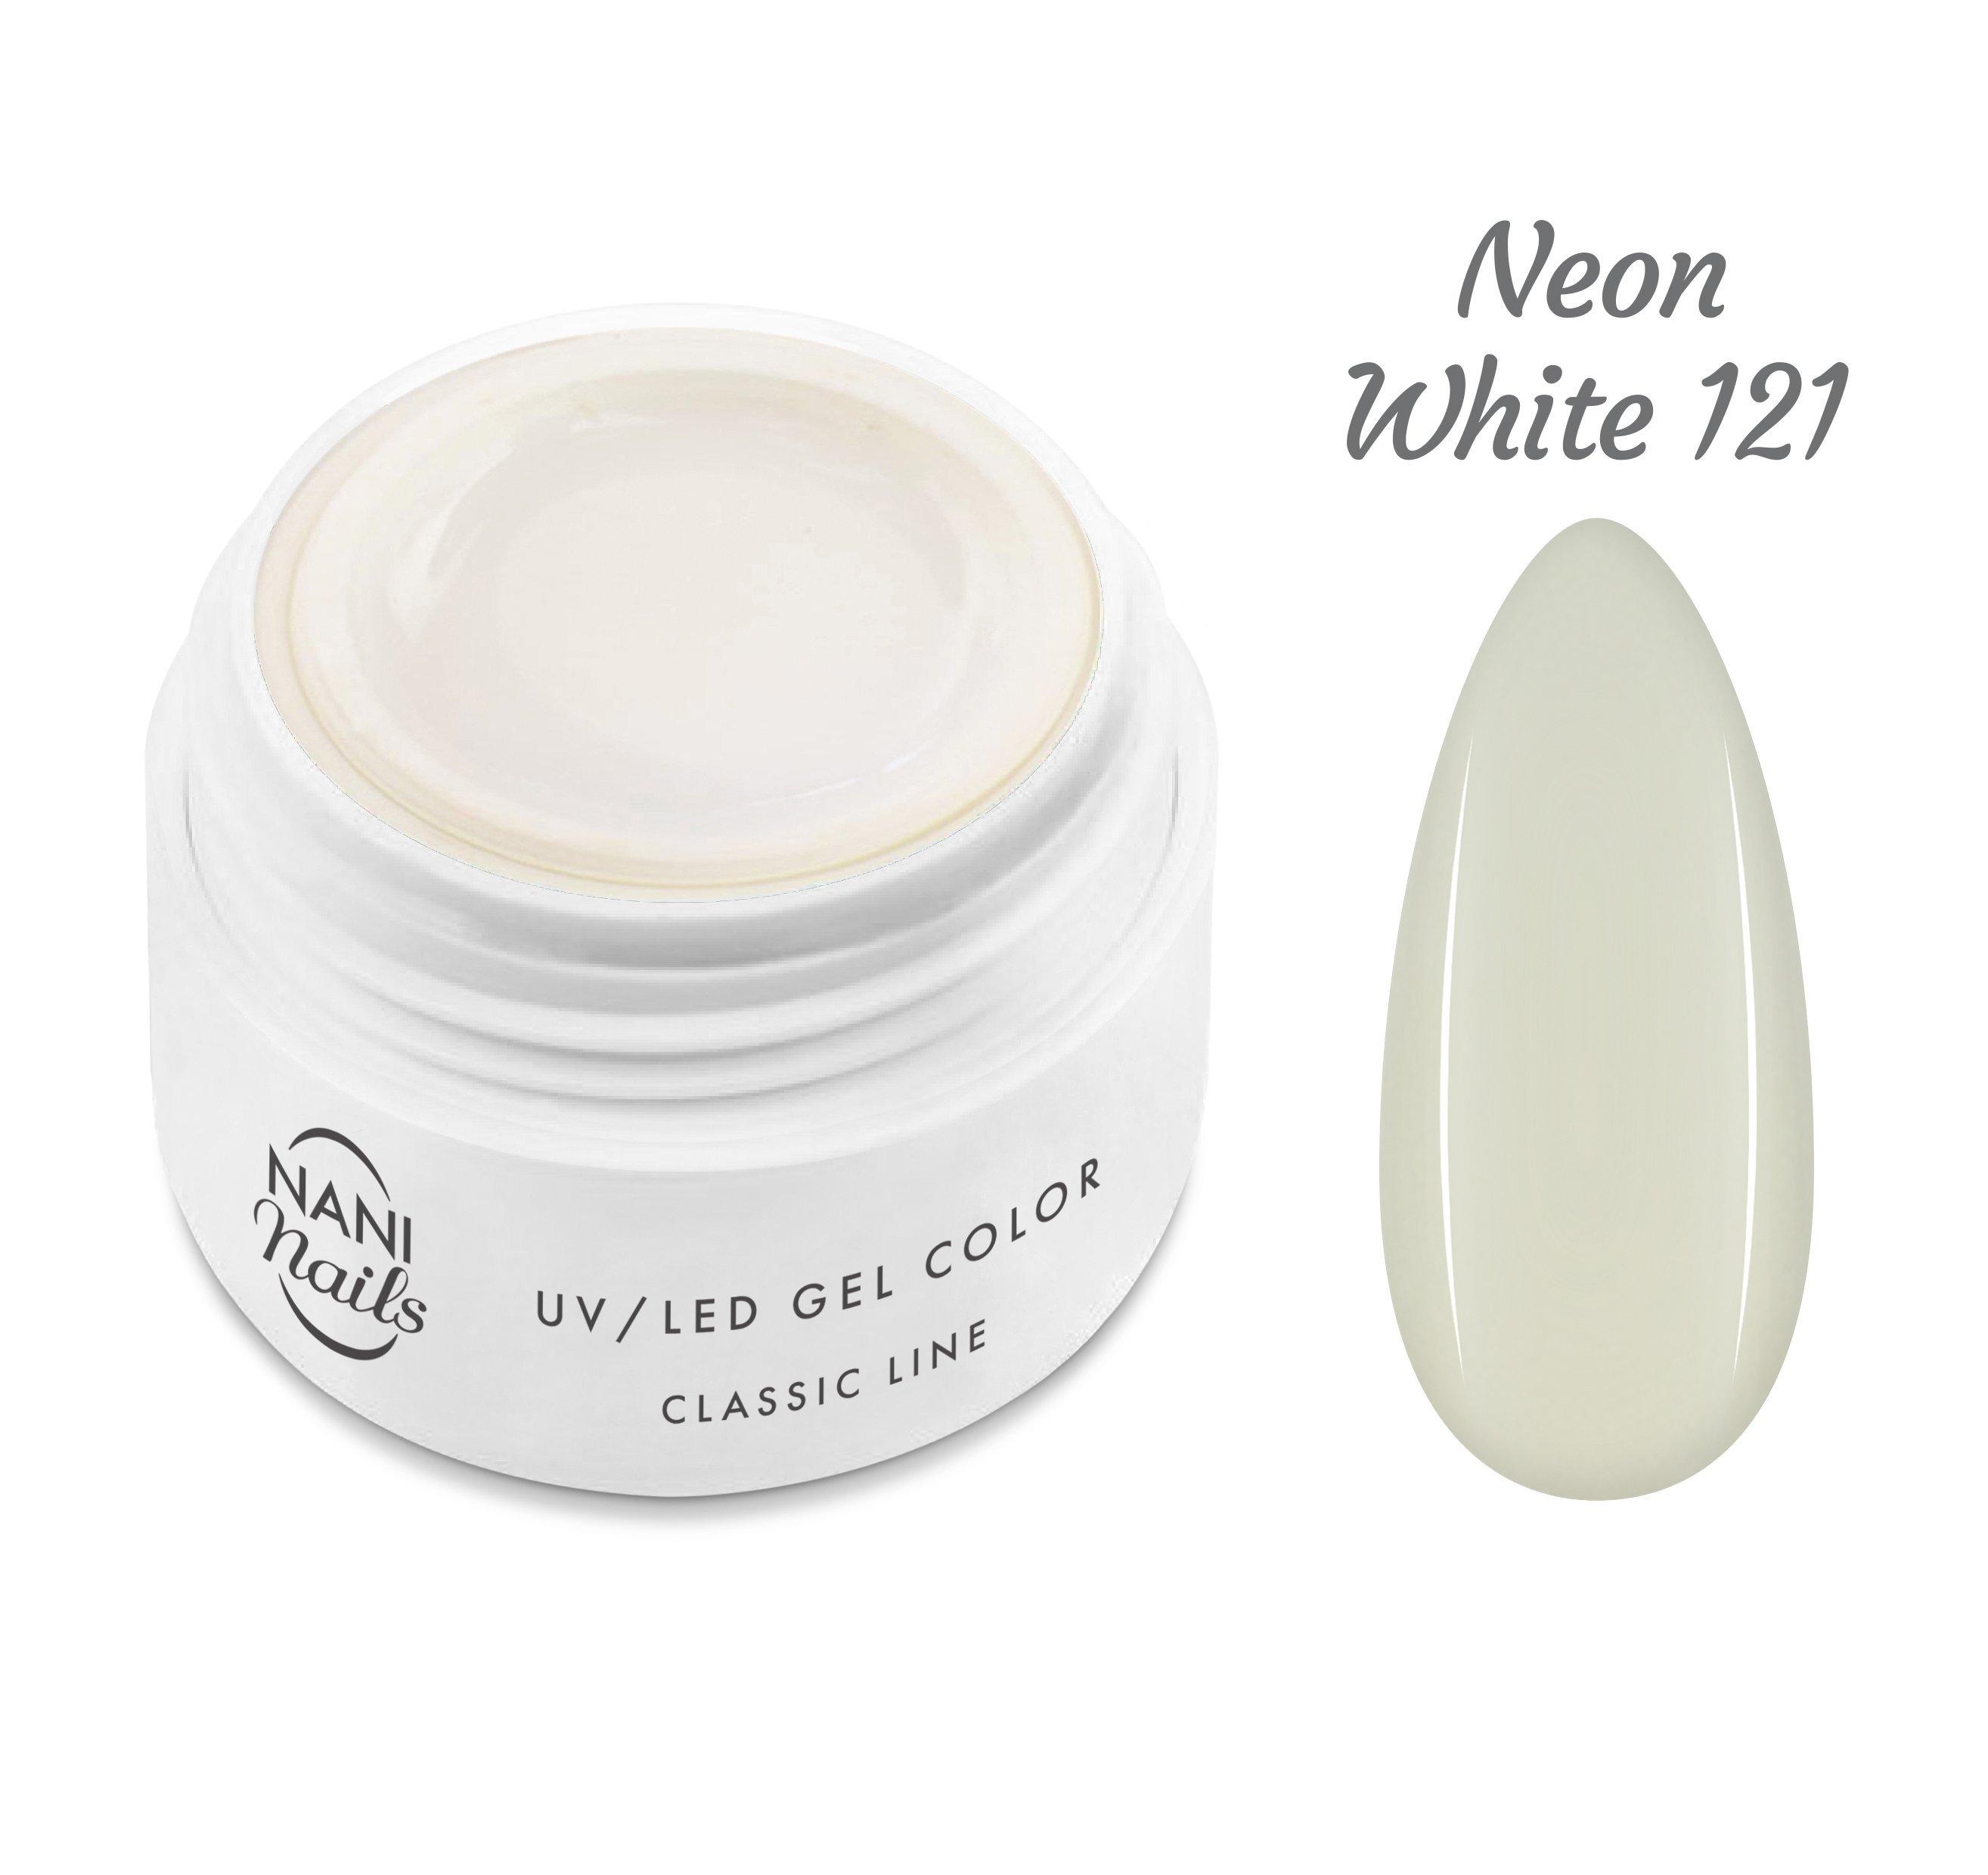 NANI UV gél Classic Neon Line 5 ml - Neon White